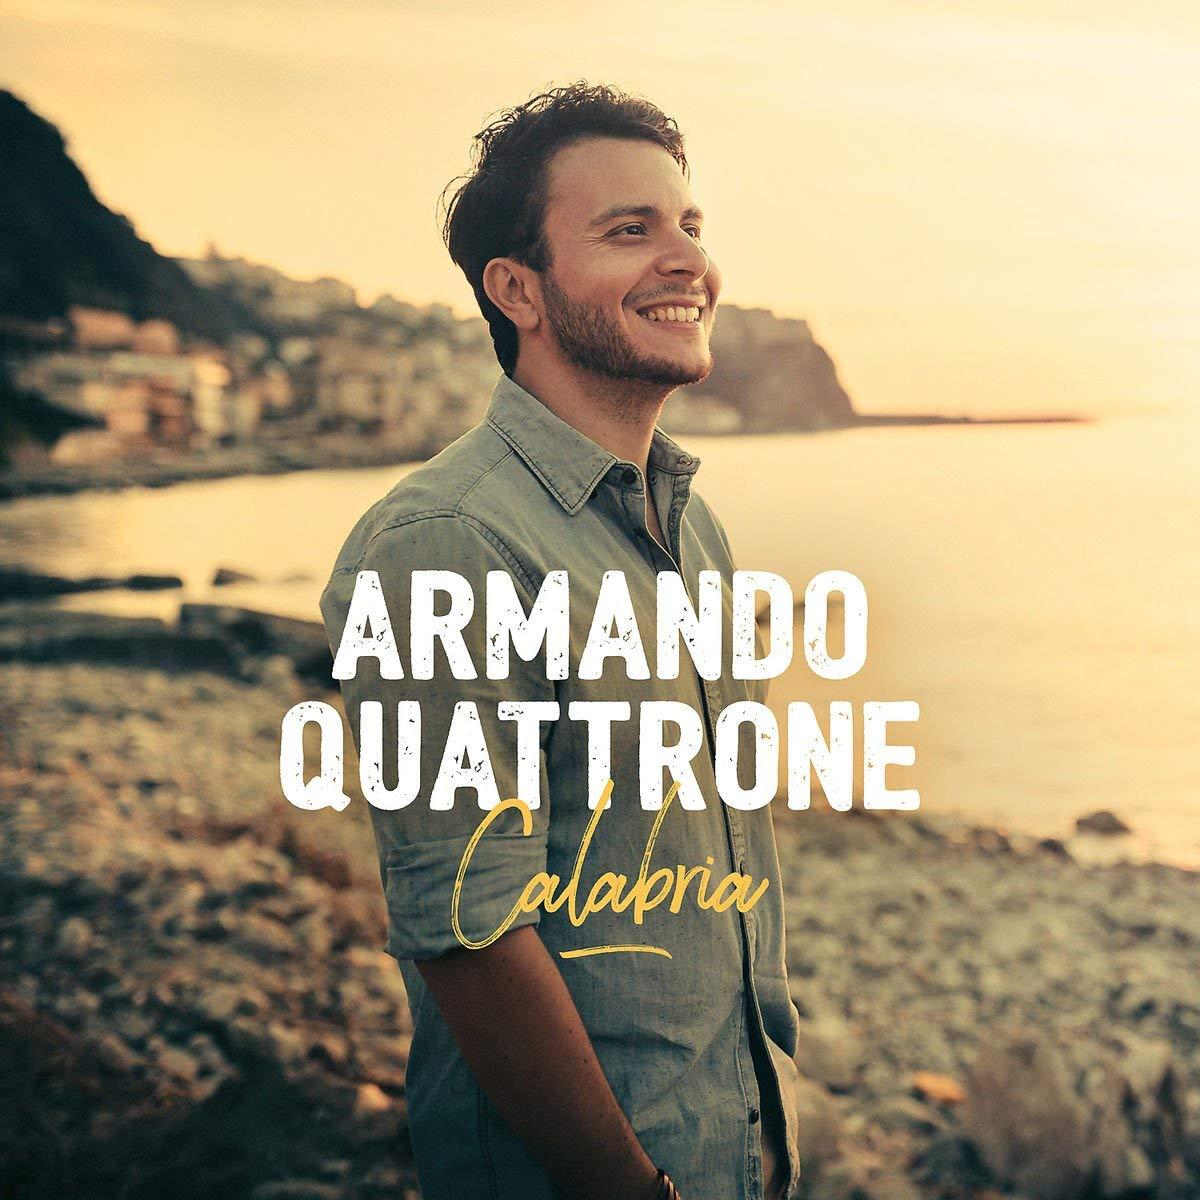 Armando Quattrone_Calabria Album Cover 01_All Tracks Written & Produced by SILVERJAM